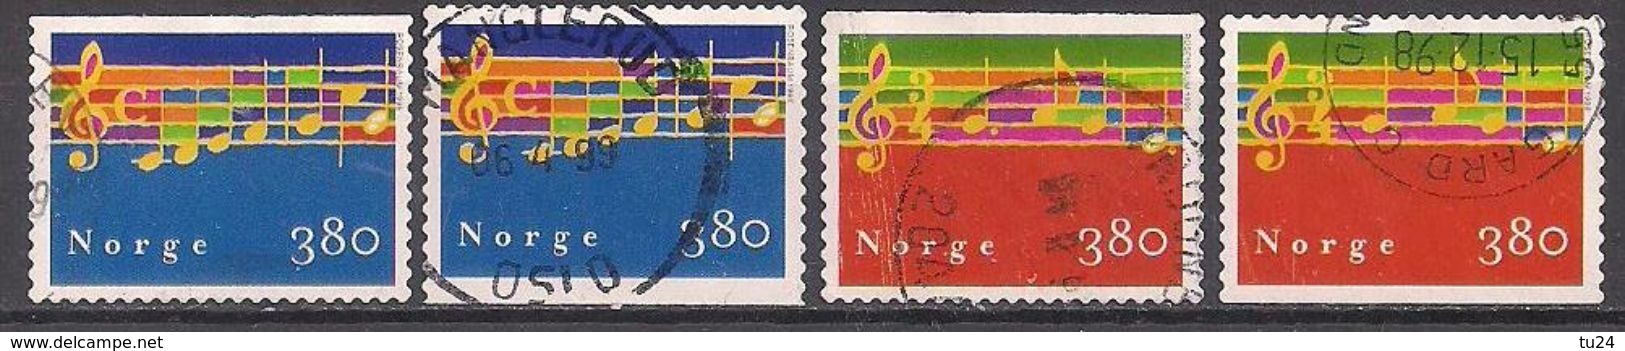 Norwegen  (1998)  Mi.Nr. 1297 + 1298  Gest. / Used  (6fi22) - Gebraucht